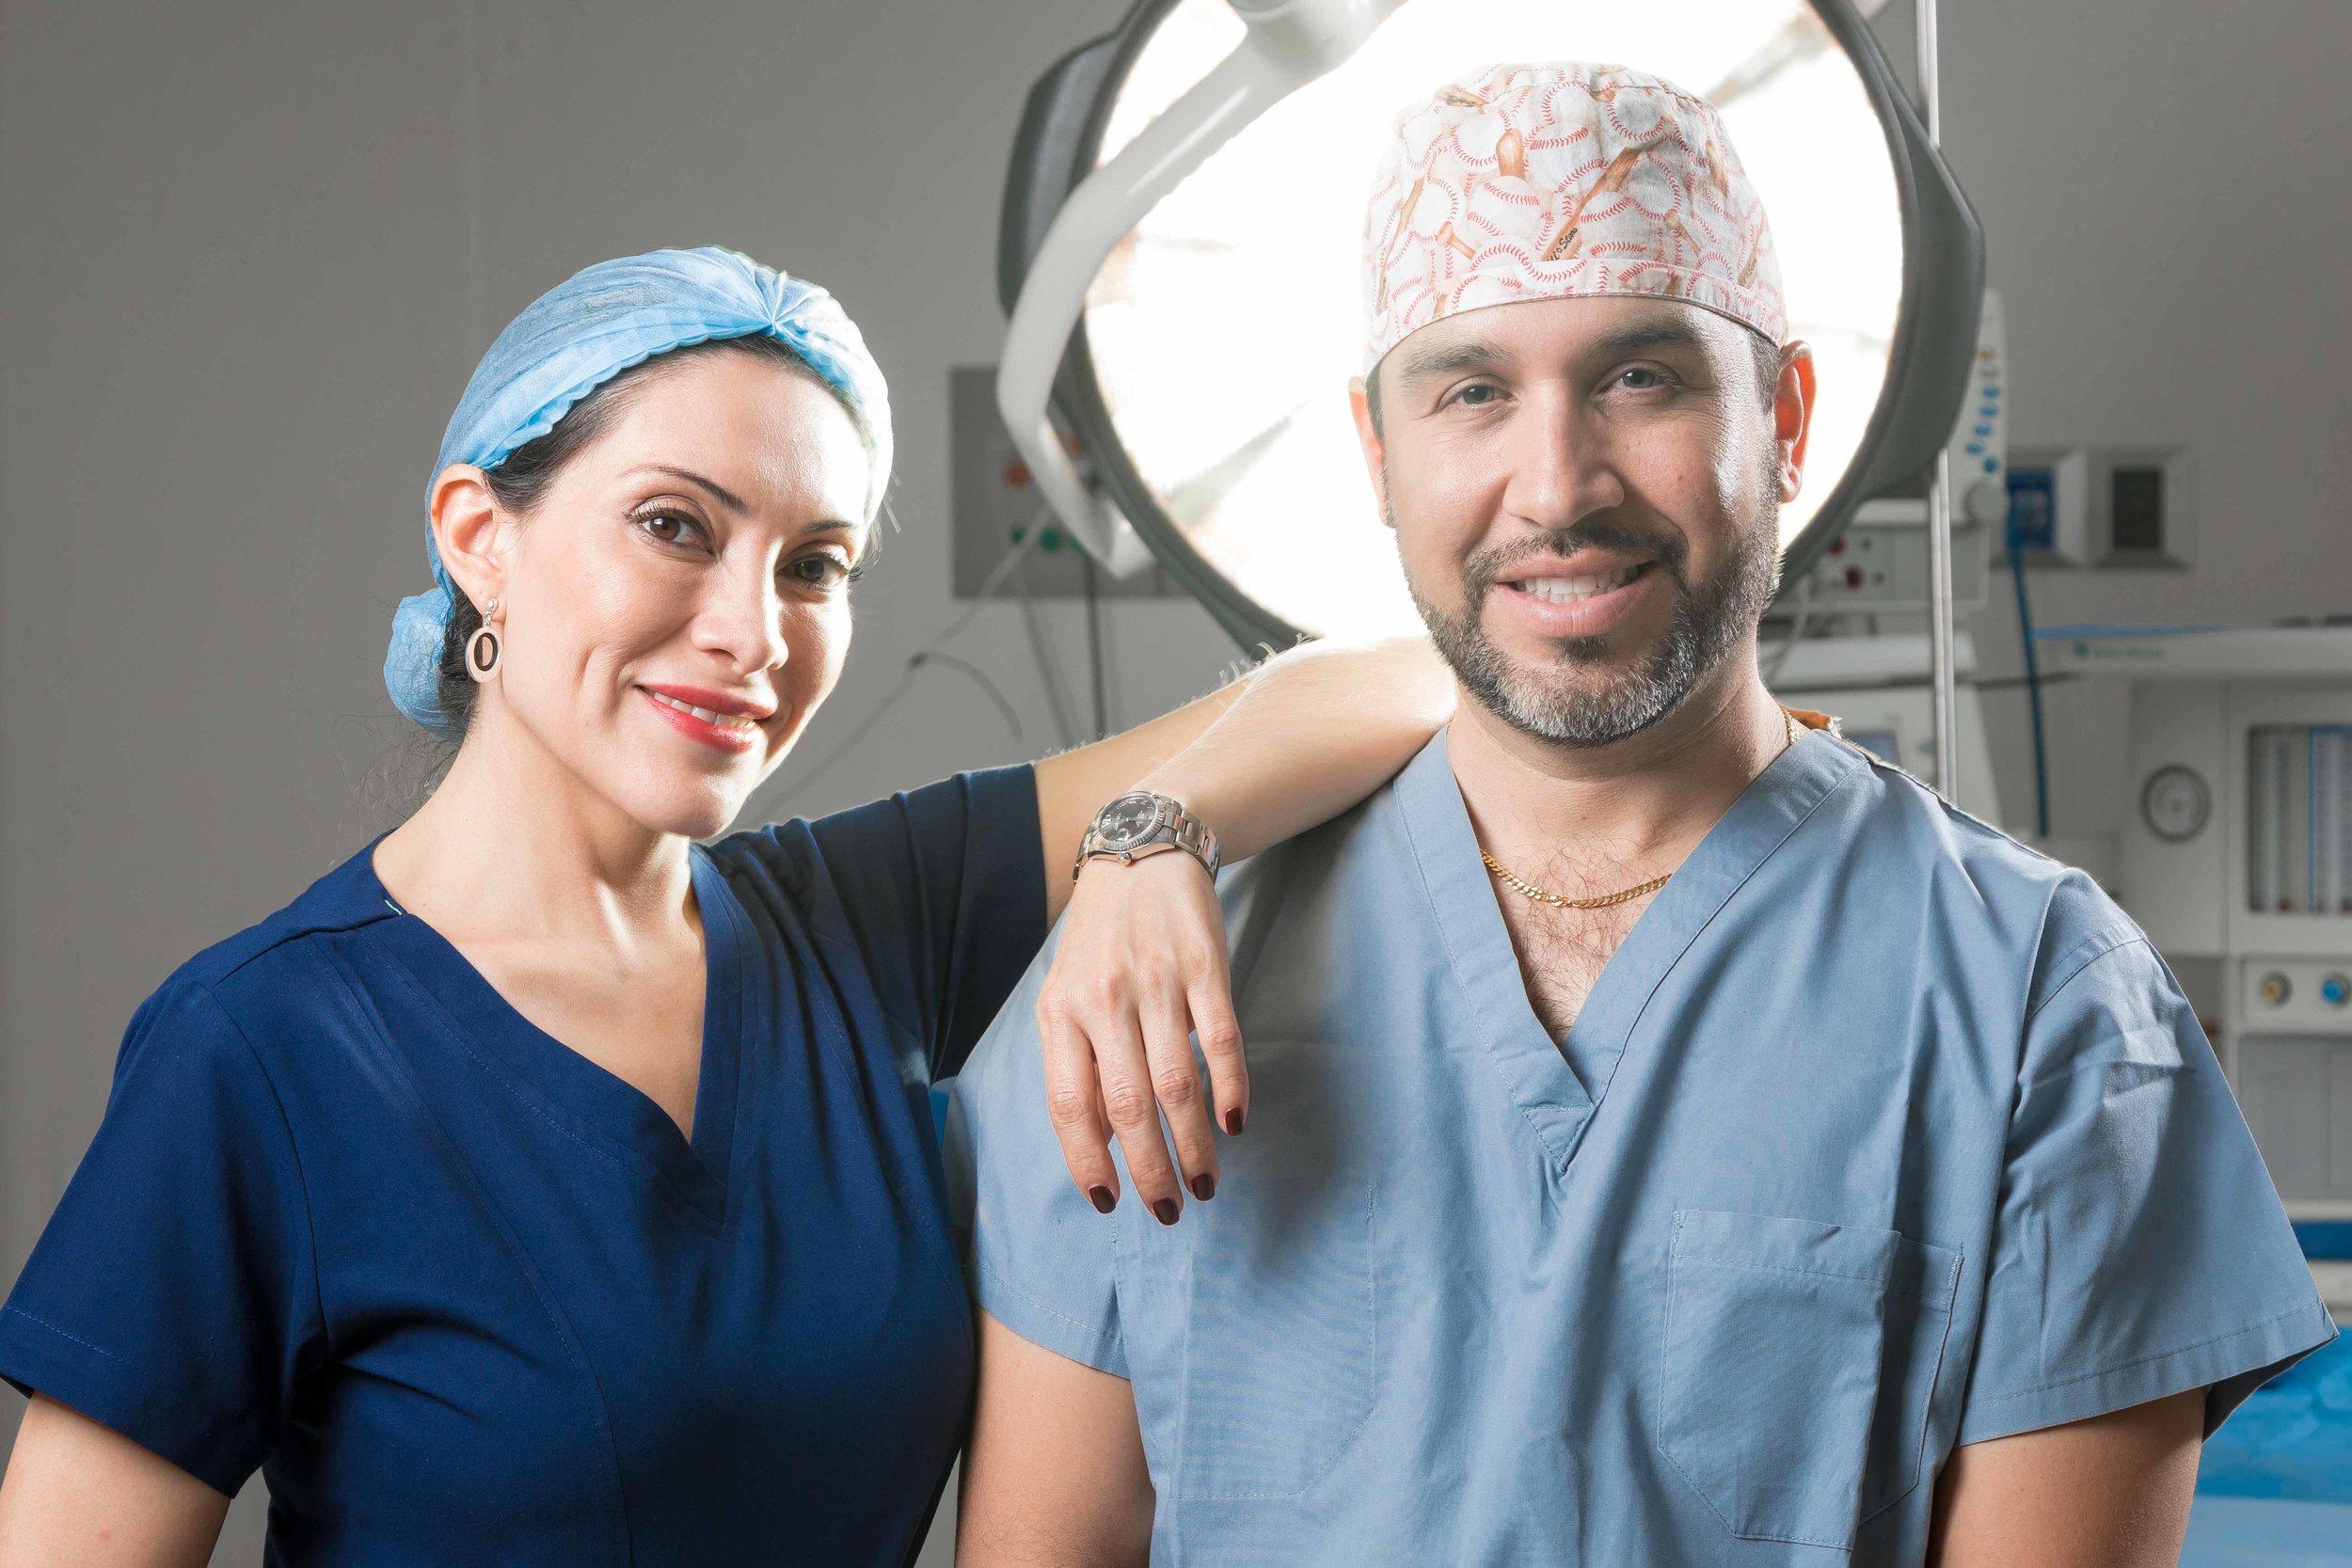 Cirujanos Plásticos by Adrián Tapia-5307.jpg